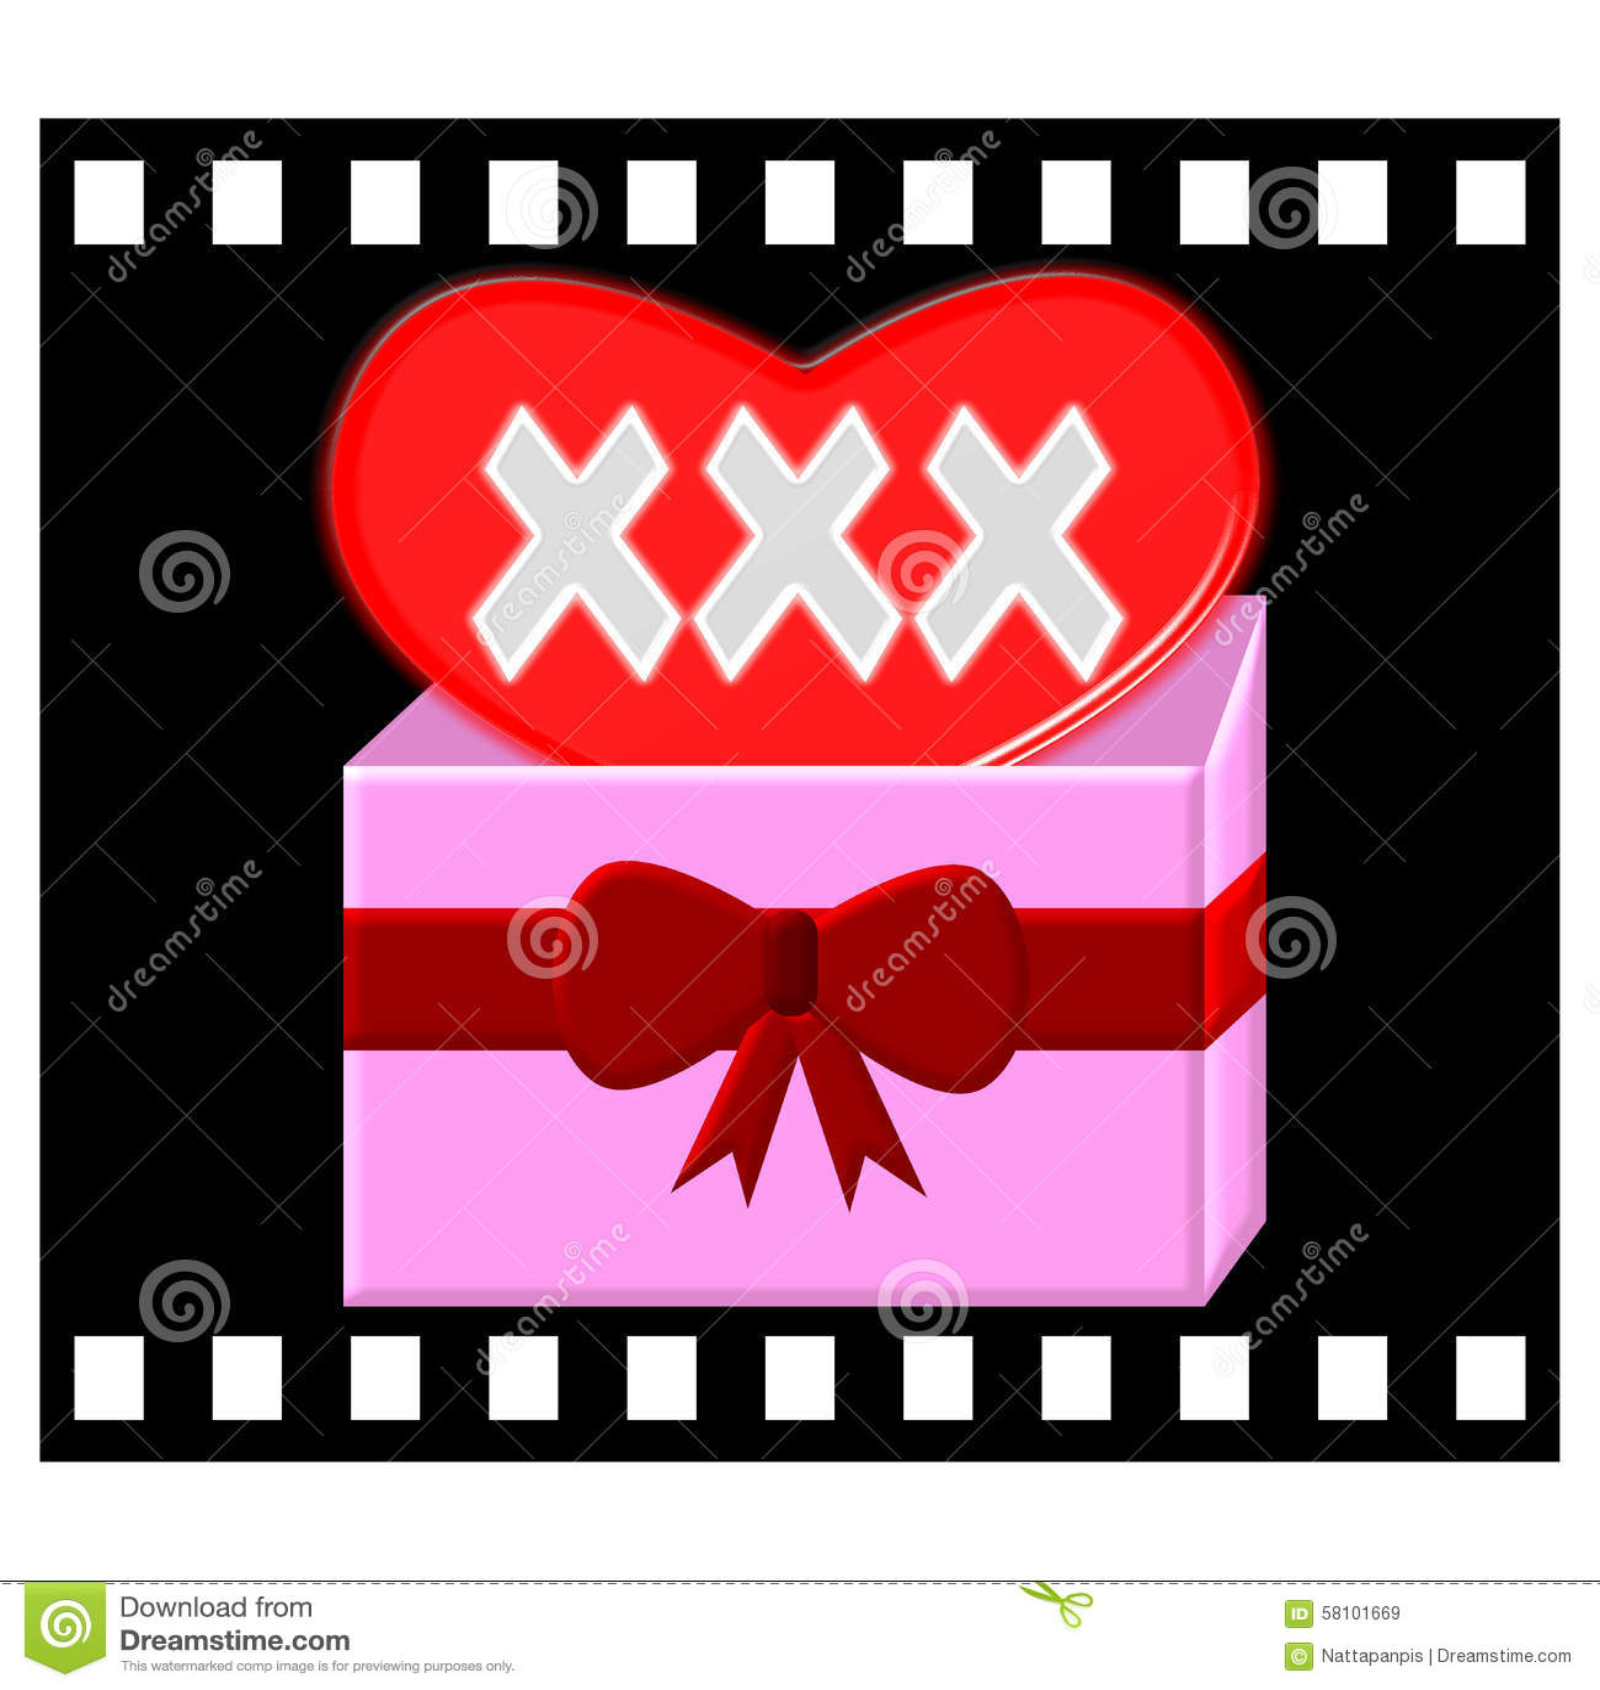 Xxx gift box symbol in movie film illustration stock illustration xxx gift box symbol in movie film illustration biocorpaavc